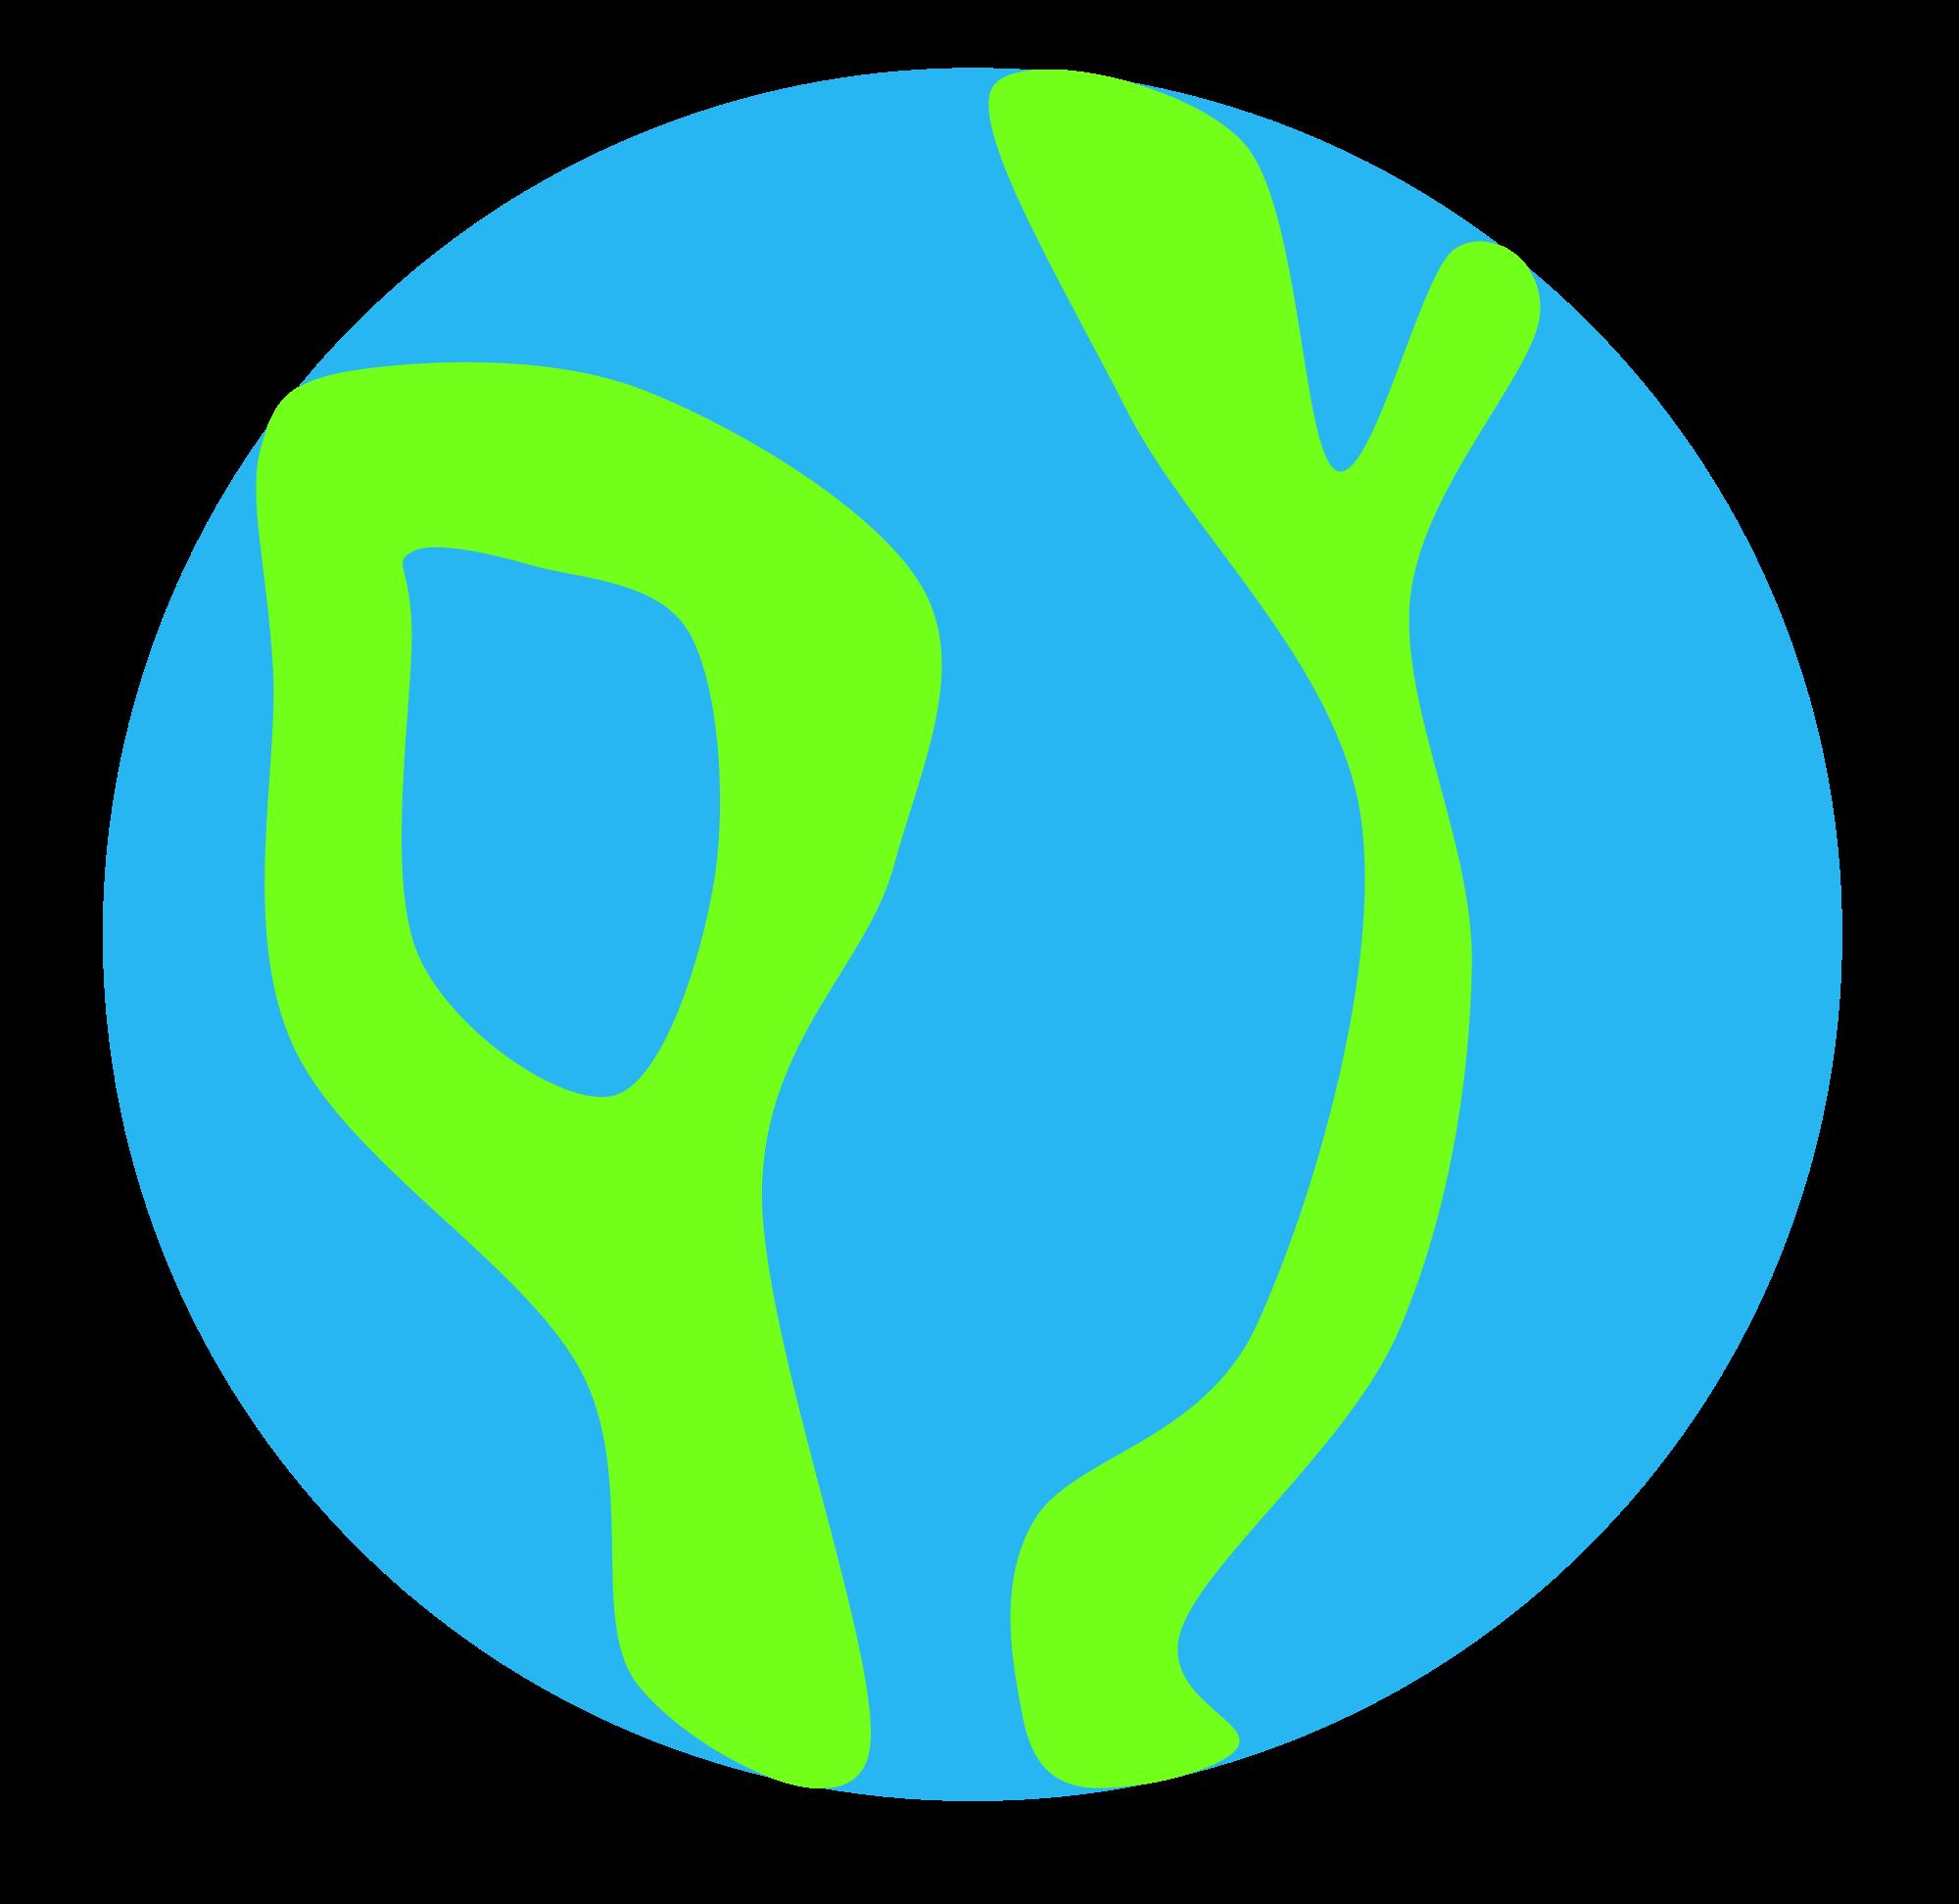 2000x1944 Planet Clip Art Free Clipart Images 9